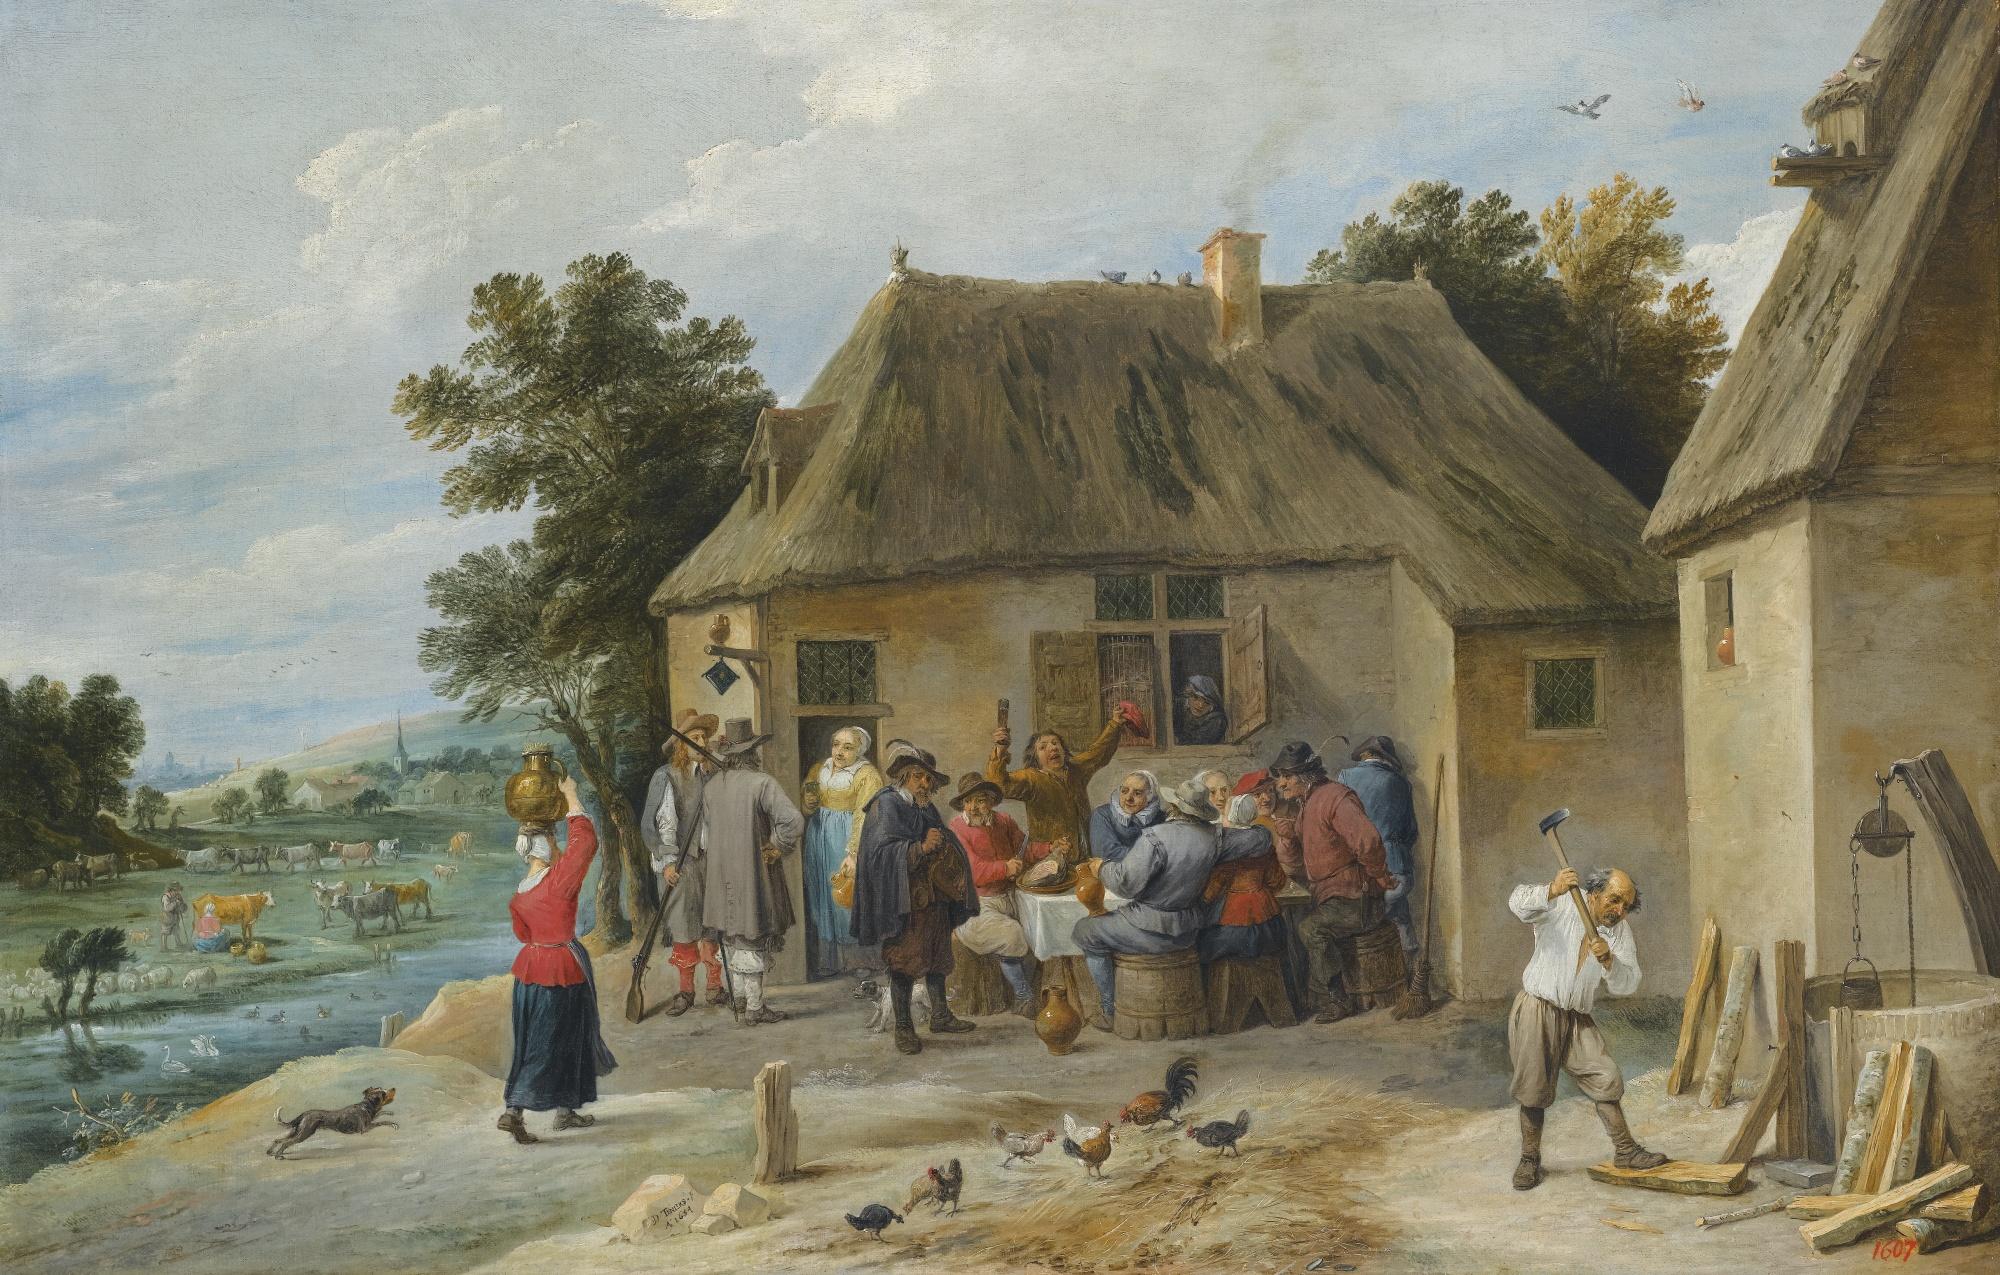 File:David Teniers II Countryside Inn 1654.jpg - Wikimedia Commons